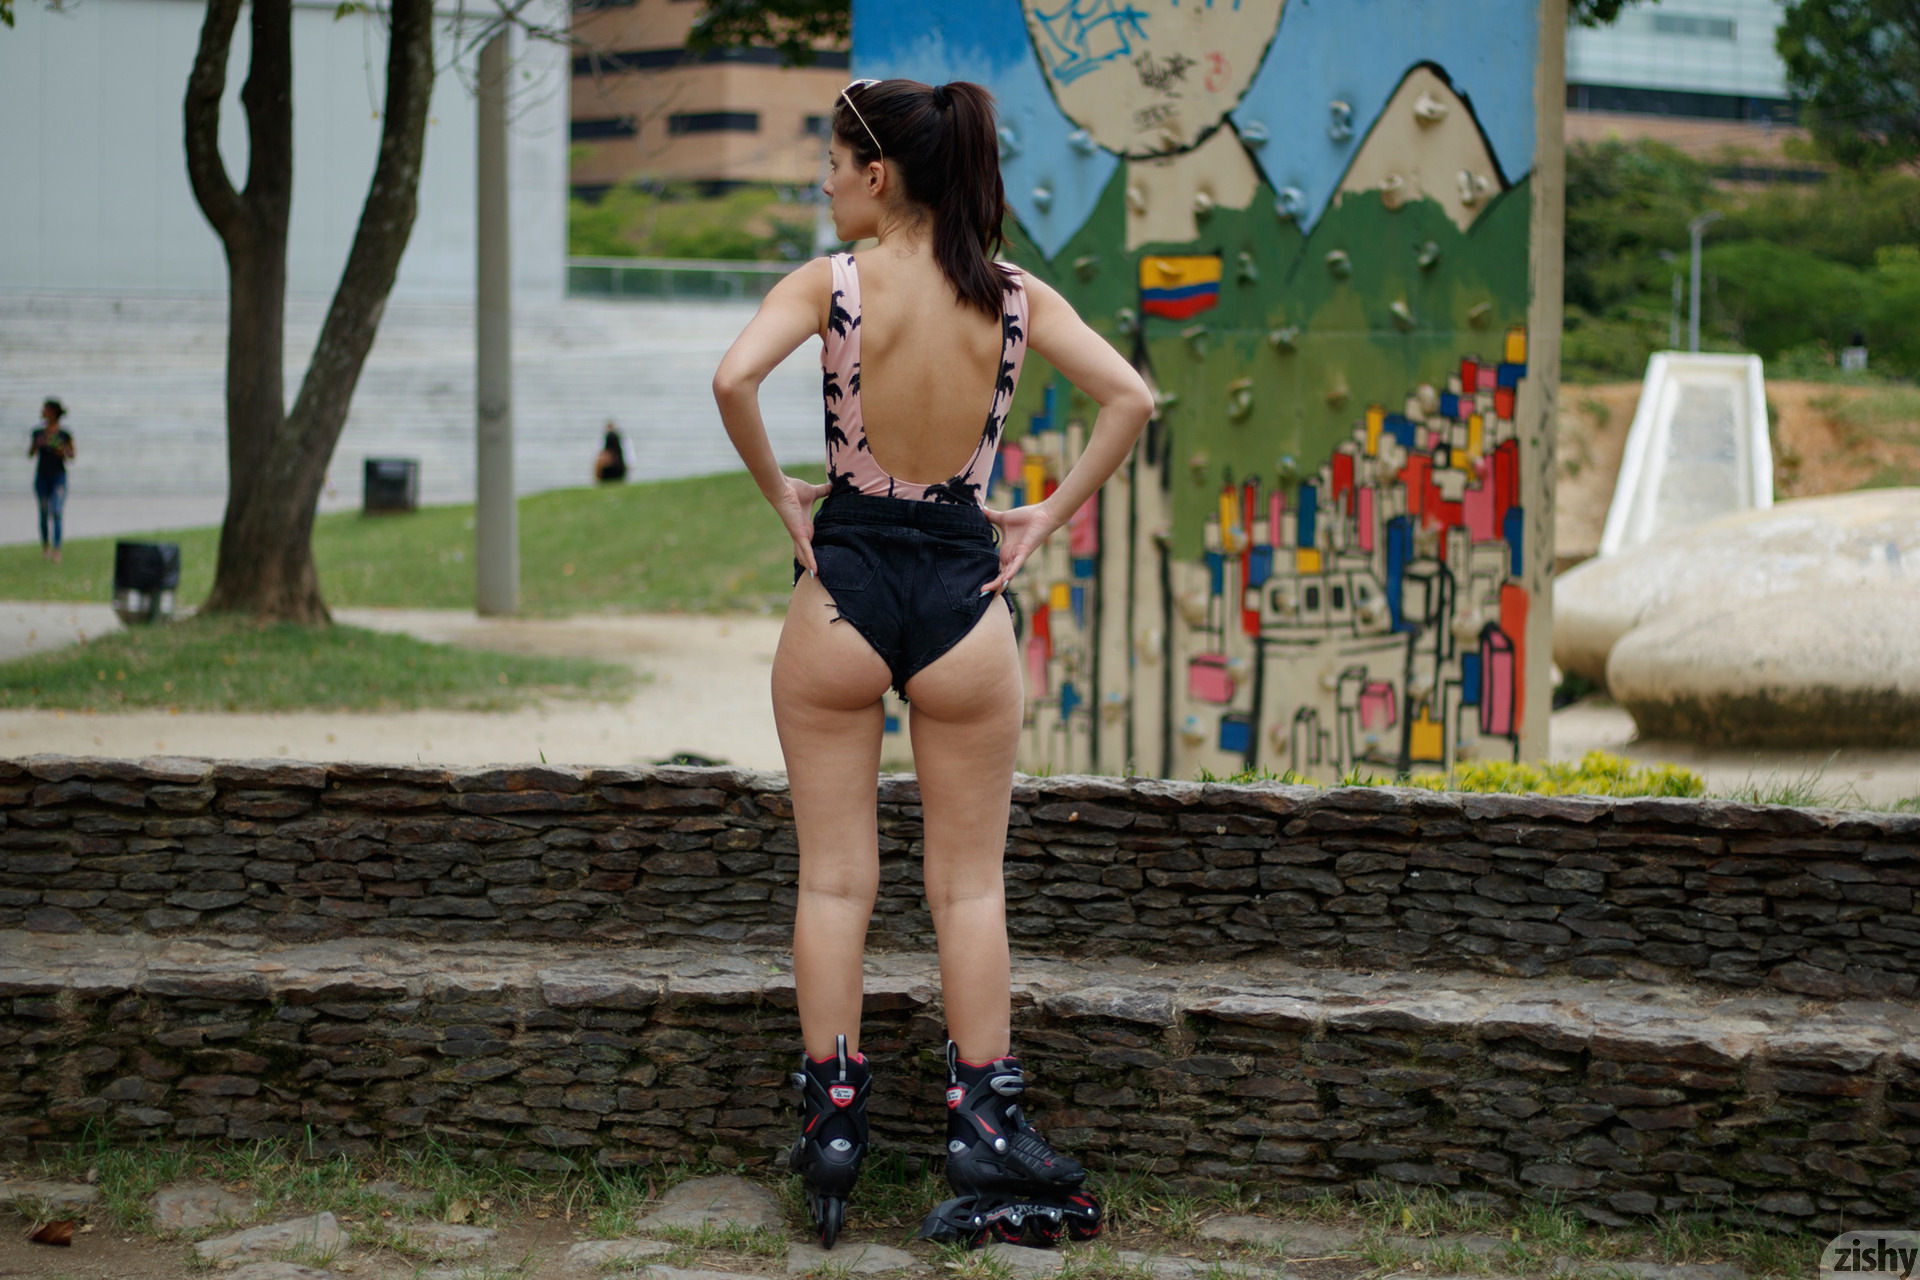 Kate Maze Skates Colombia Zishy (28)